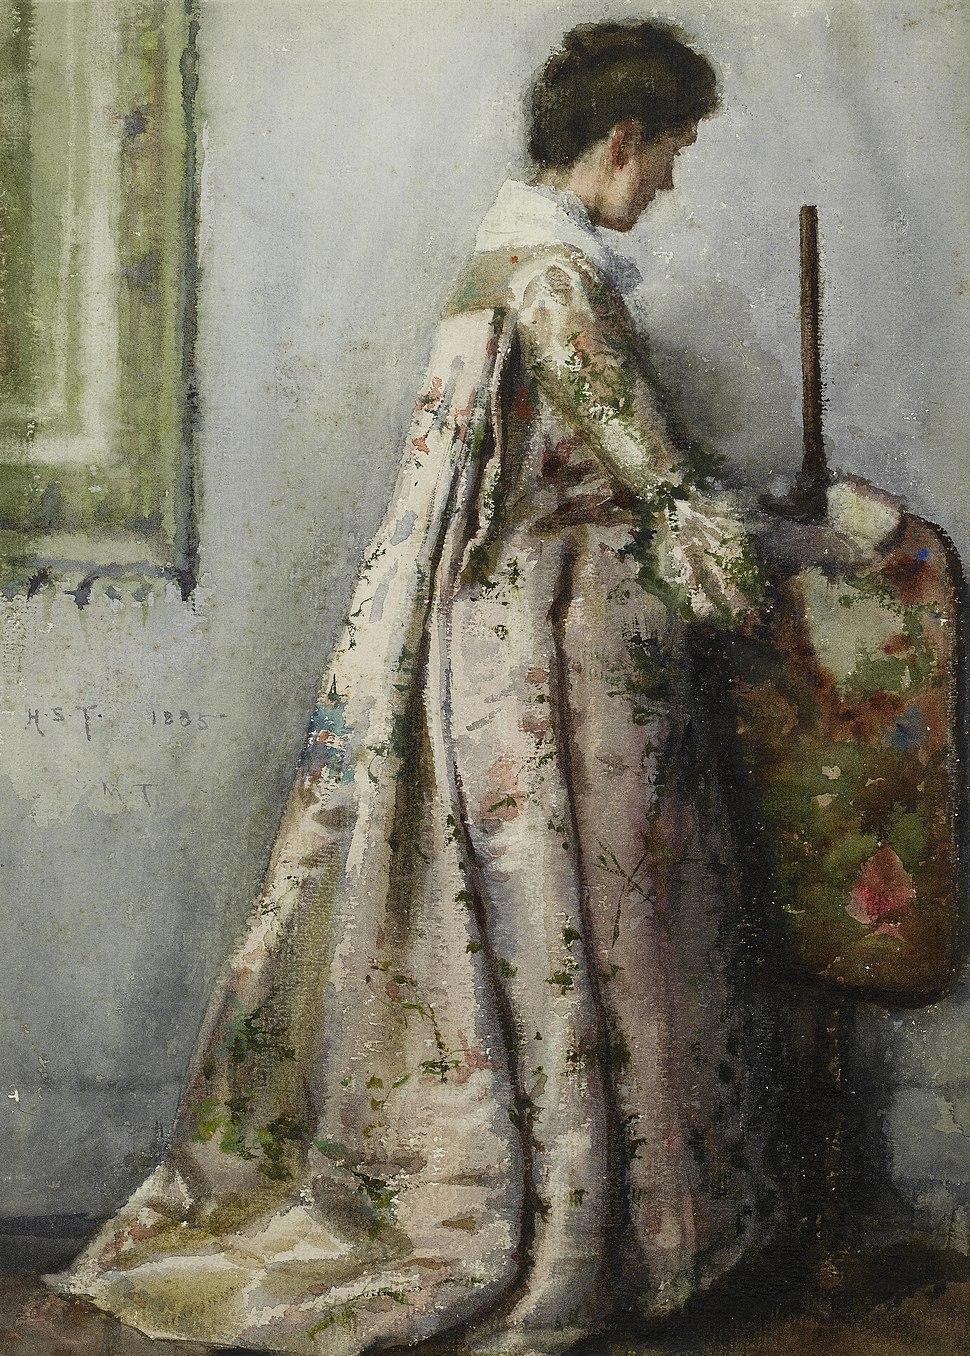 Henry Scott Tuke - The silk gown, Portrait of Maria Tuke Sainsbury